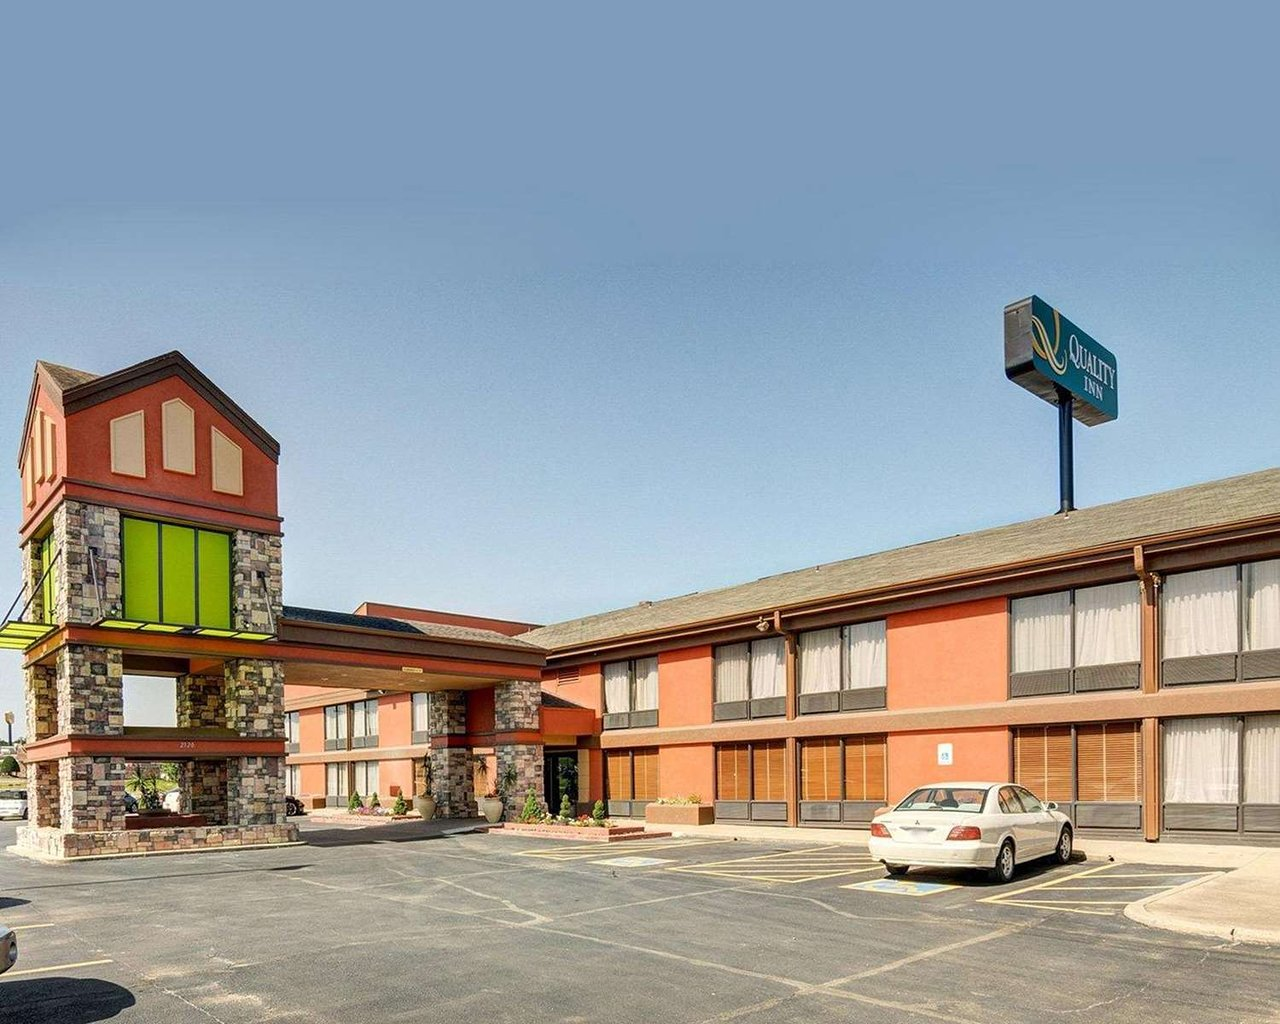 Rude very rude - Review of Rodeway Inn, Fort Smith, AR - TripAdvisor